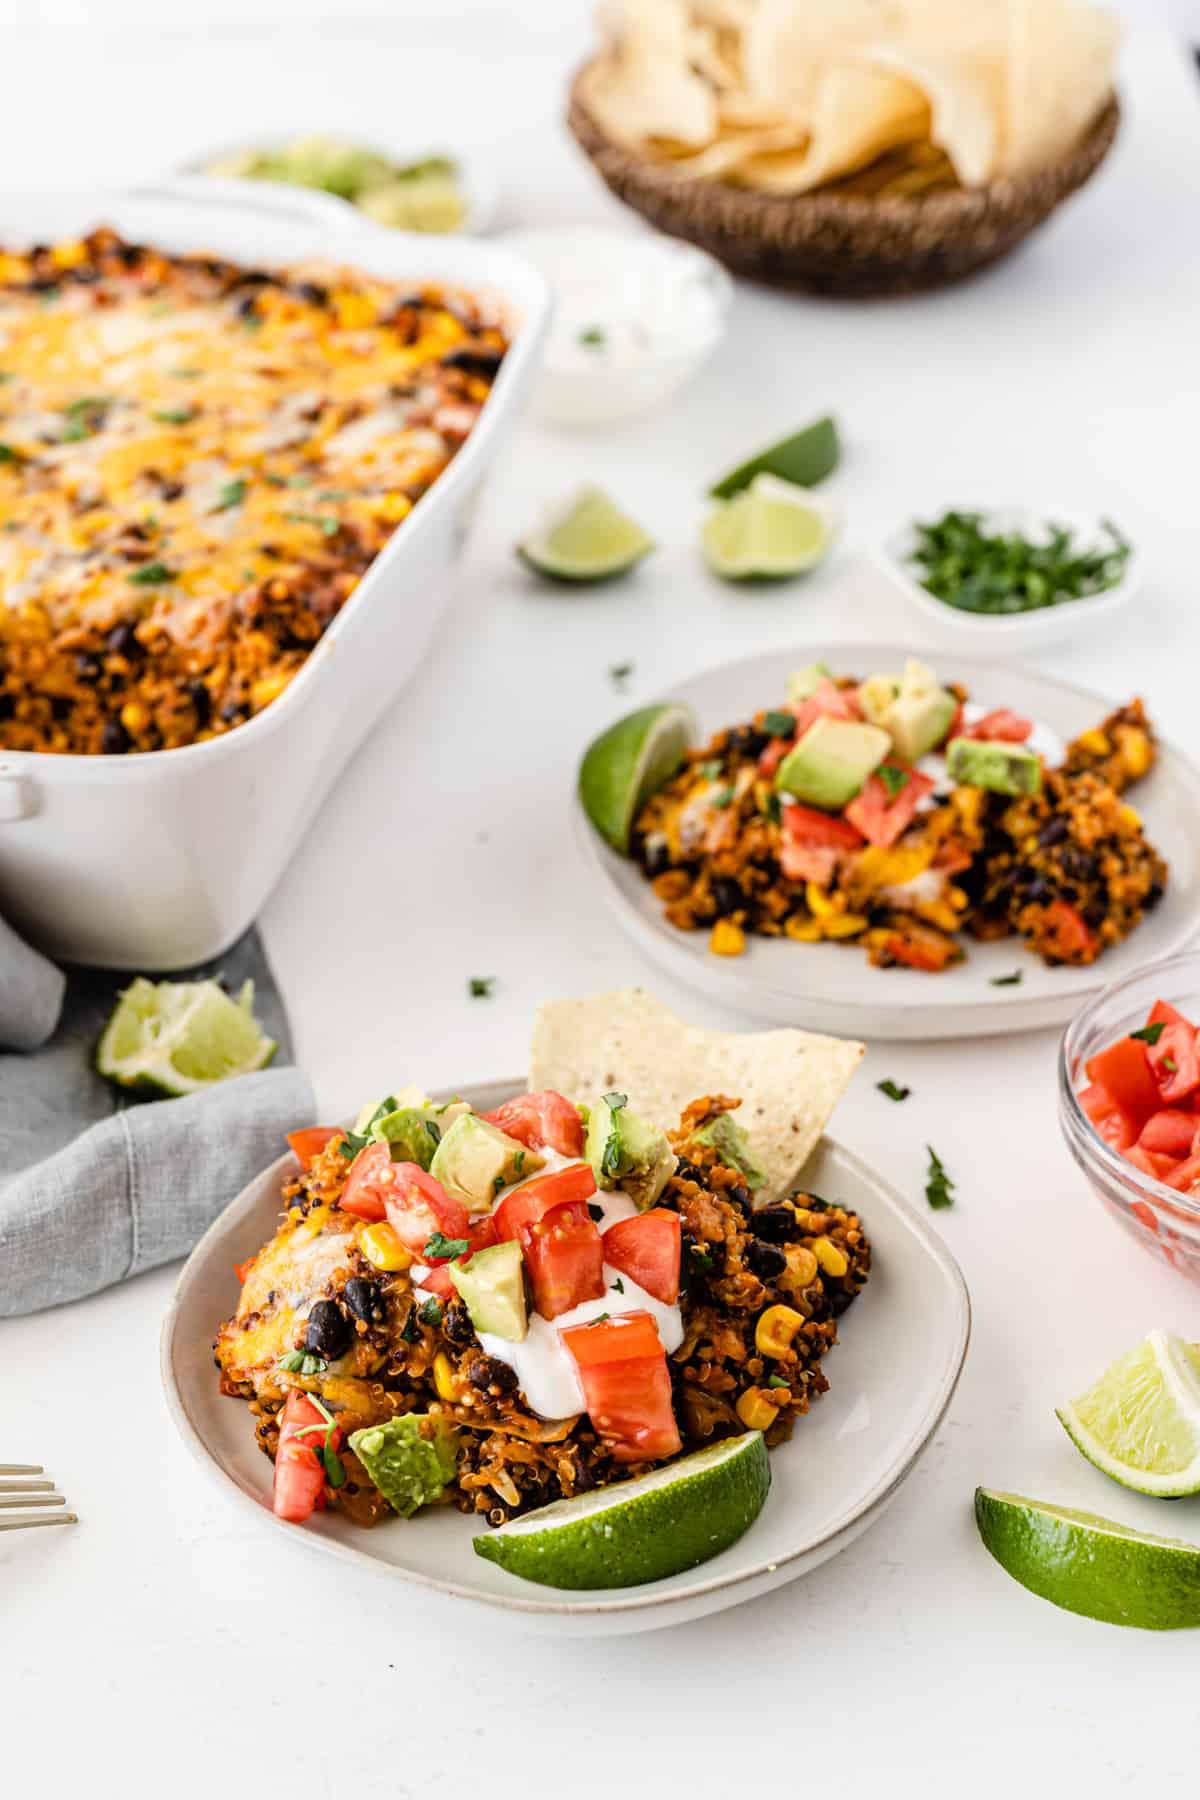 quinoa enchilada casserole on a white plate topped with sour cream, tomato, avocado, and lime